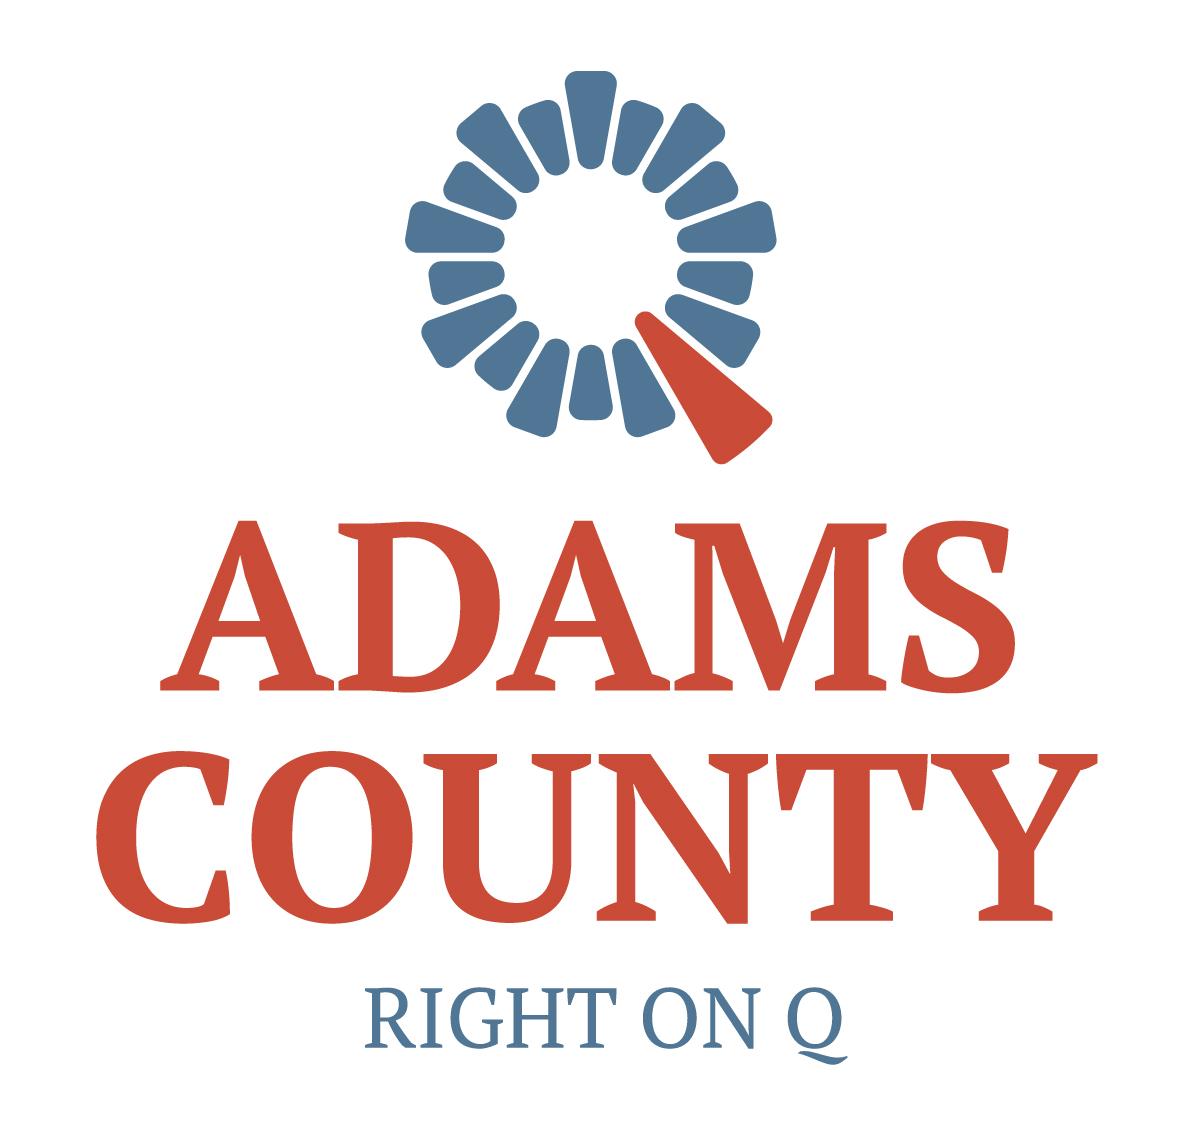 Adams County Small Business Emergency Loan